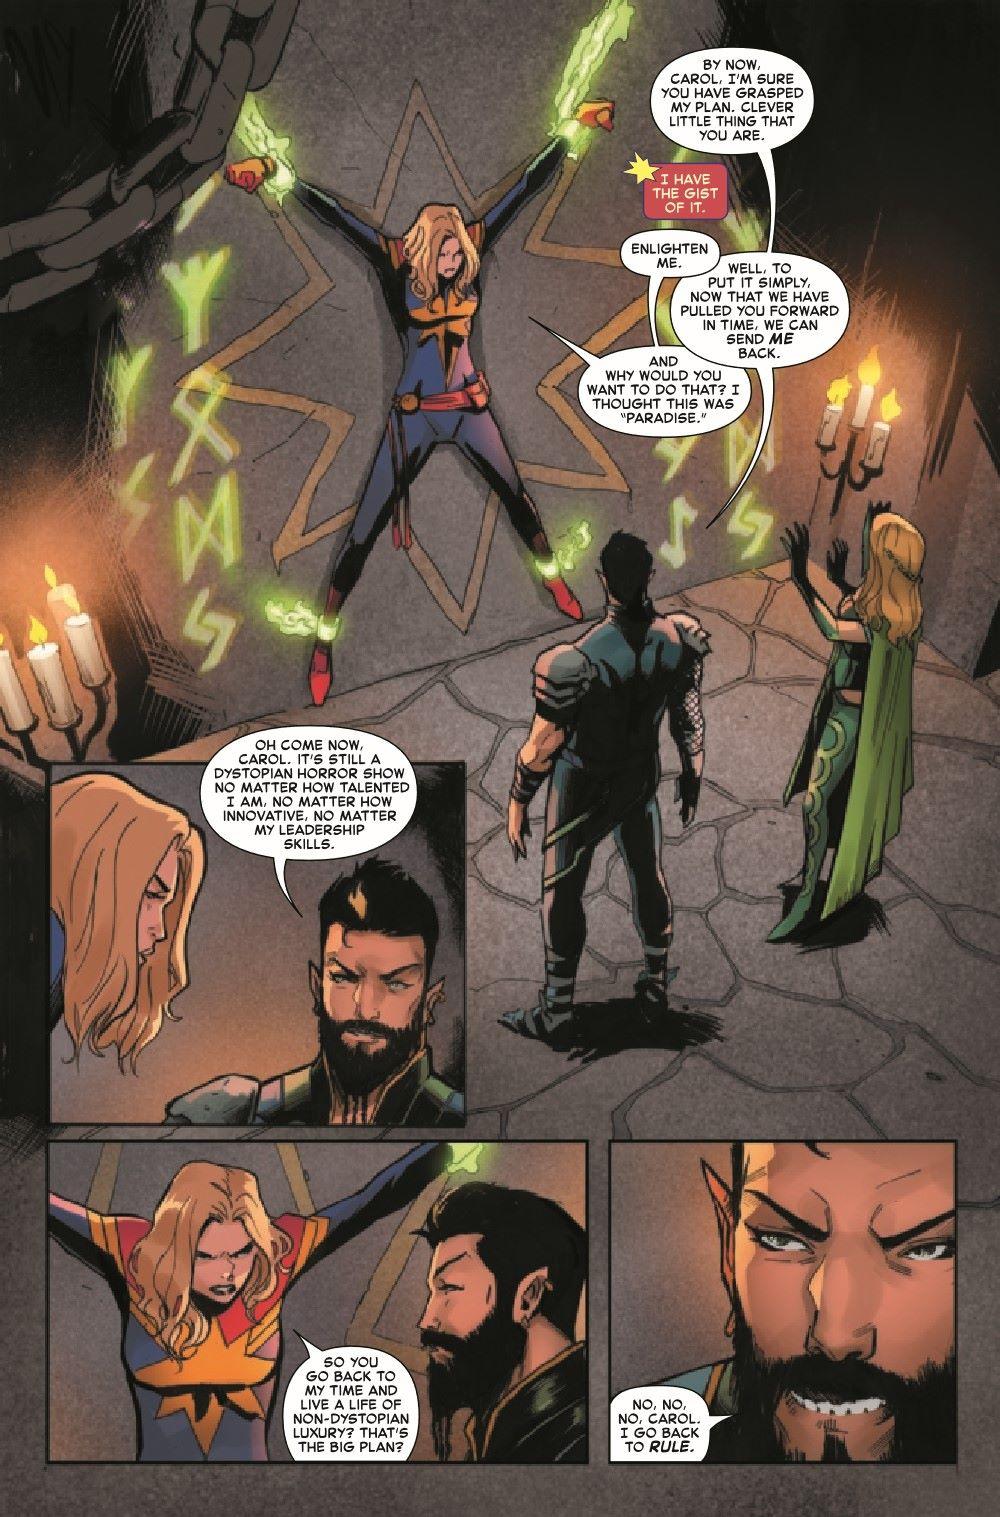 CAPMARV2019025_Preview-6 ComicList Previews: CAPTAIN MARVEL #25